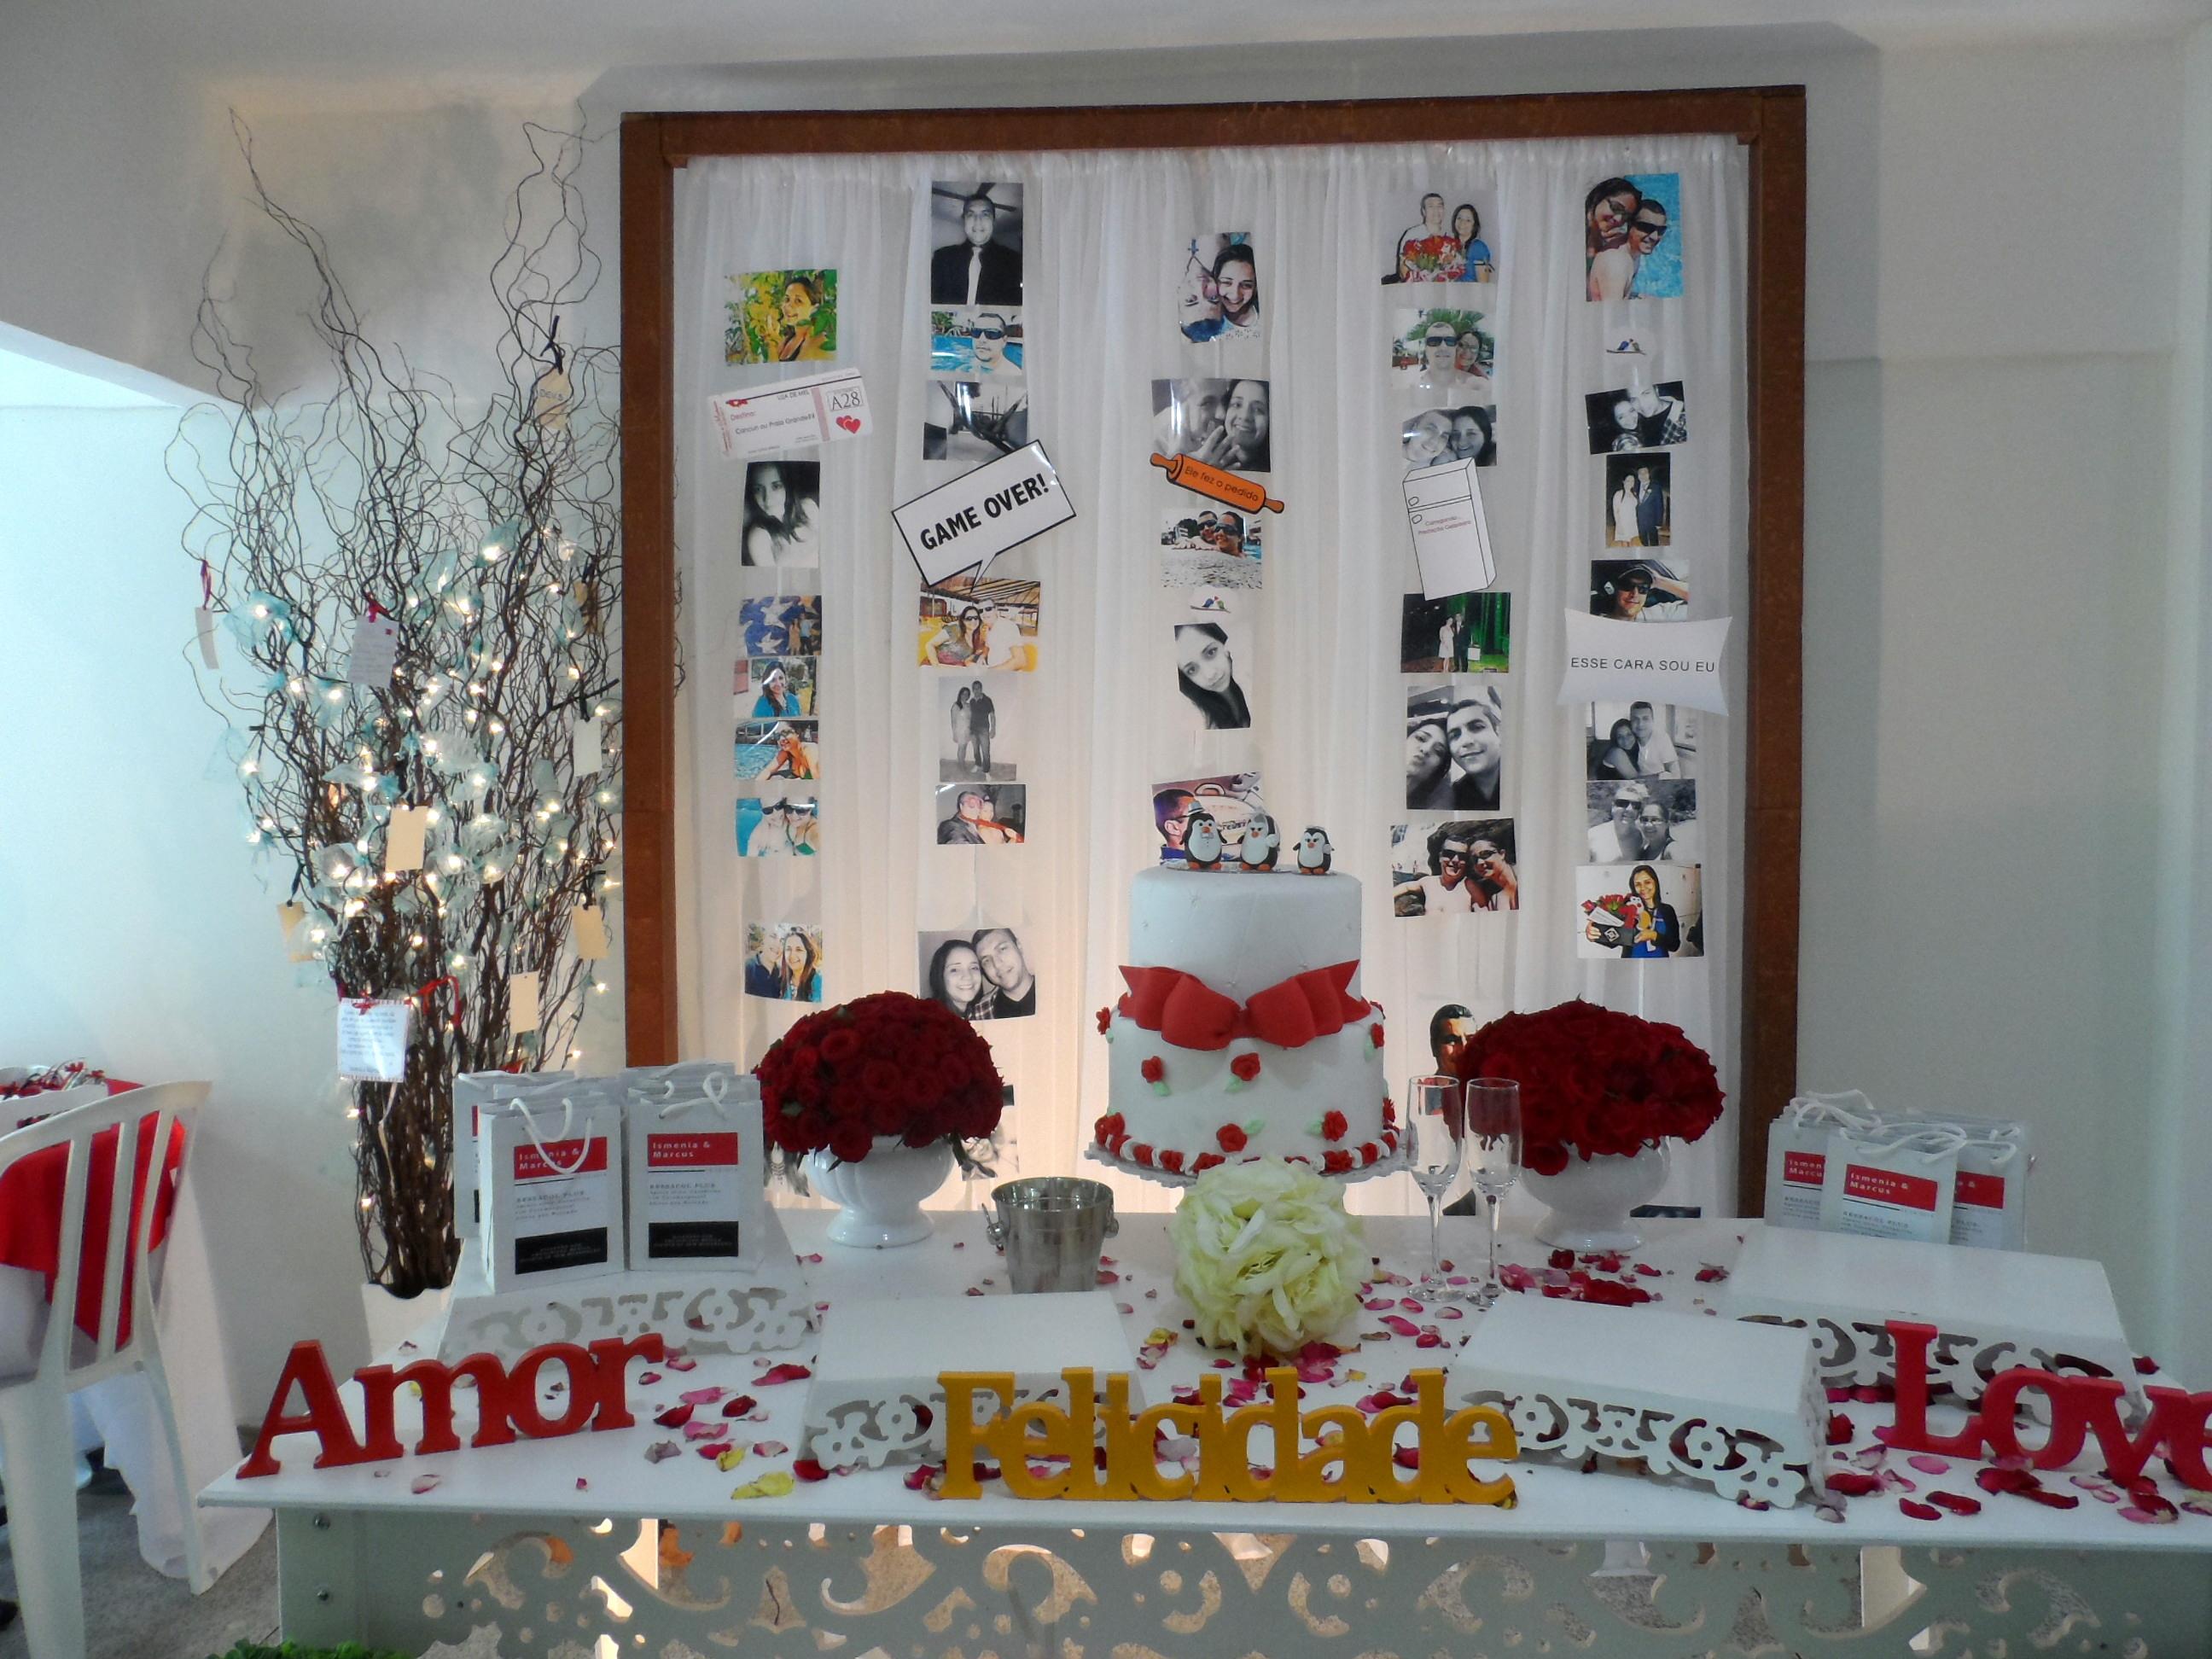 decoracao festa noivado:decoracao noivado provencal decoracao noivado decoracao noivado